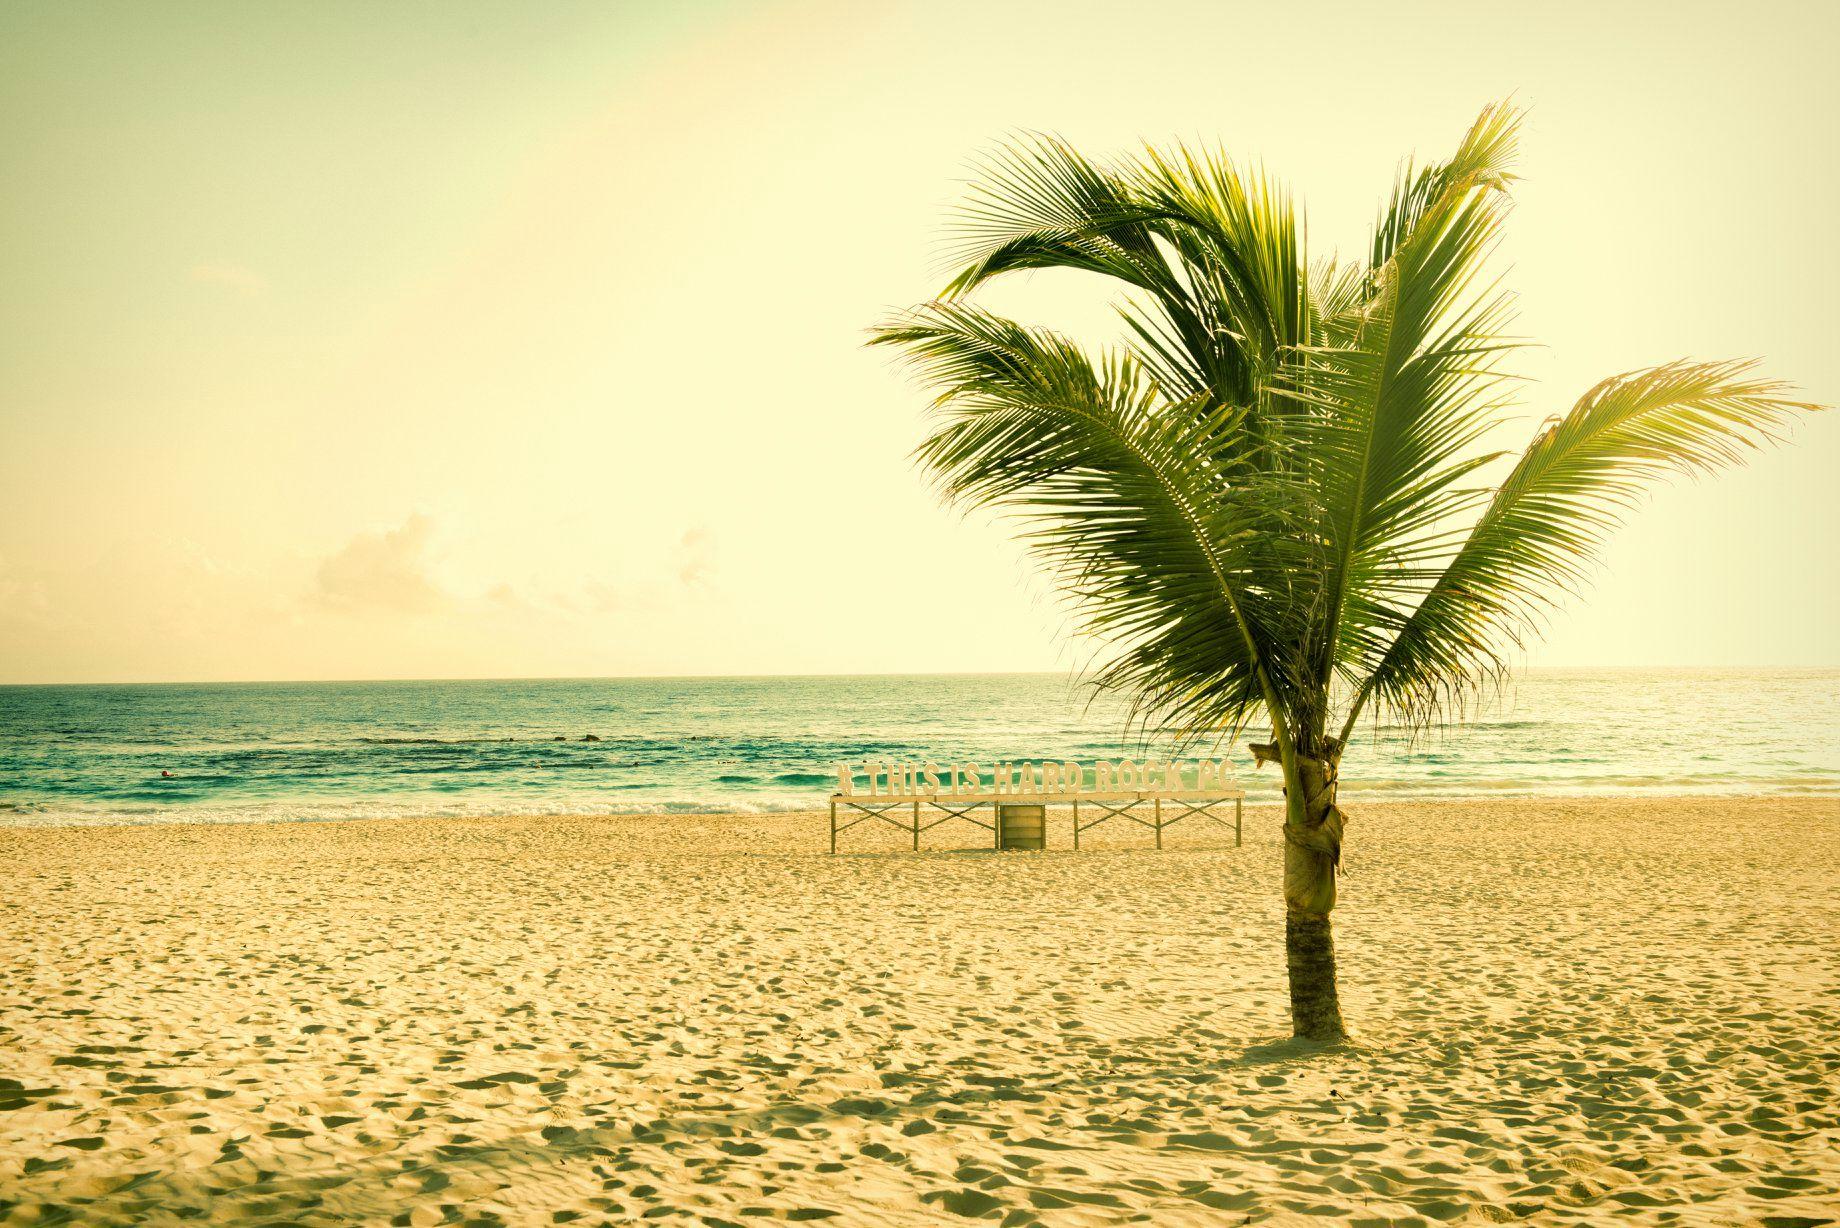 Hard Rock Resort beach Punta Cana, Dominican Republic.